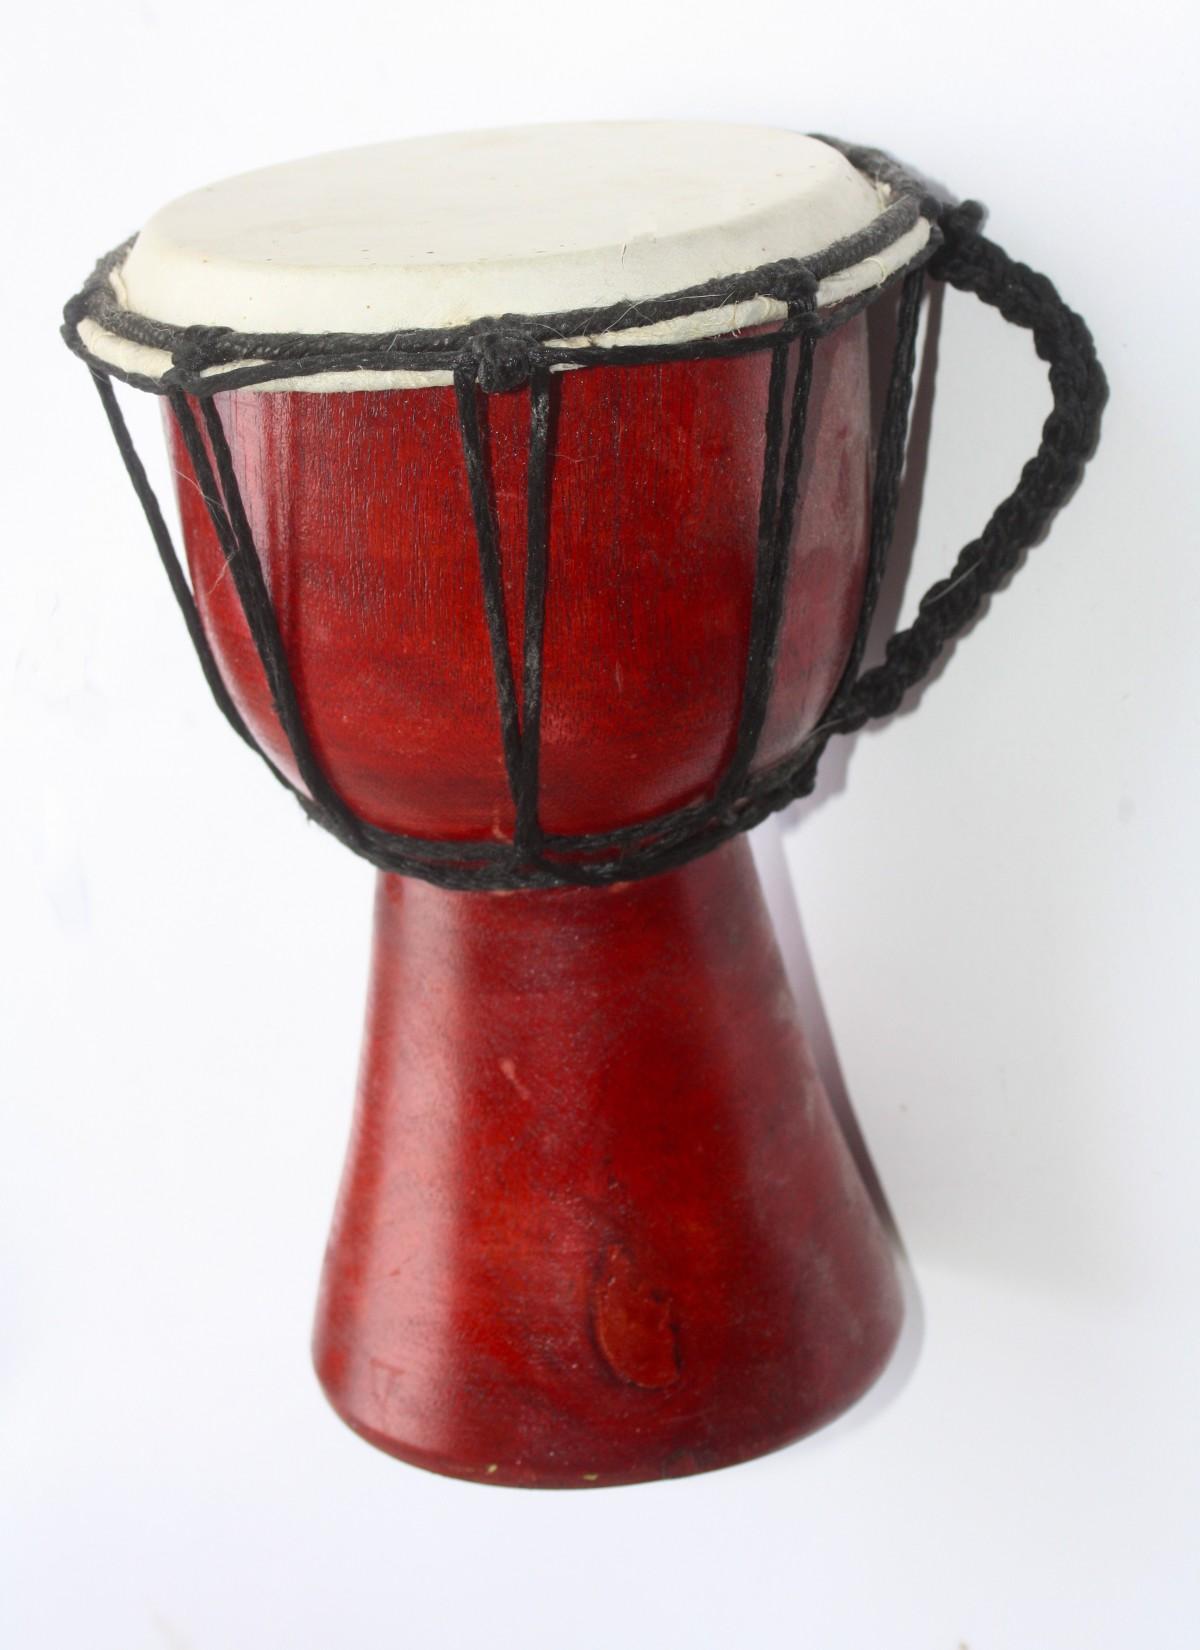 94 Gambar Alat Musik Bongo Paling Hist